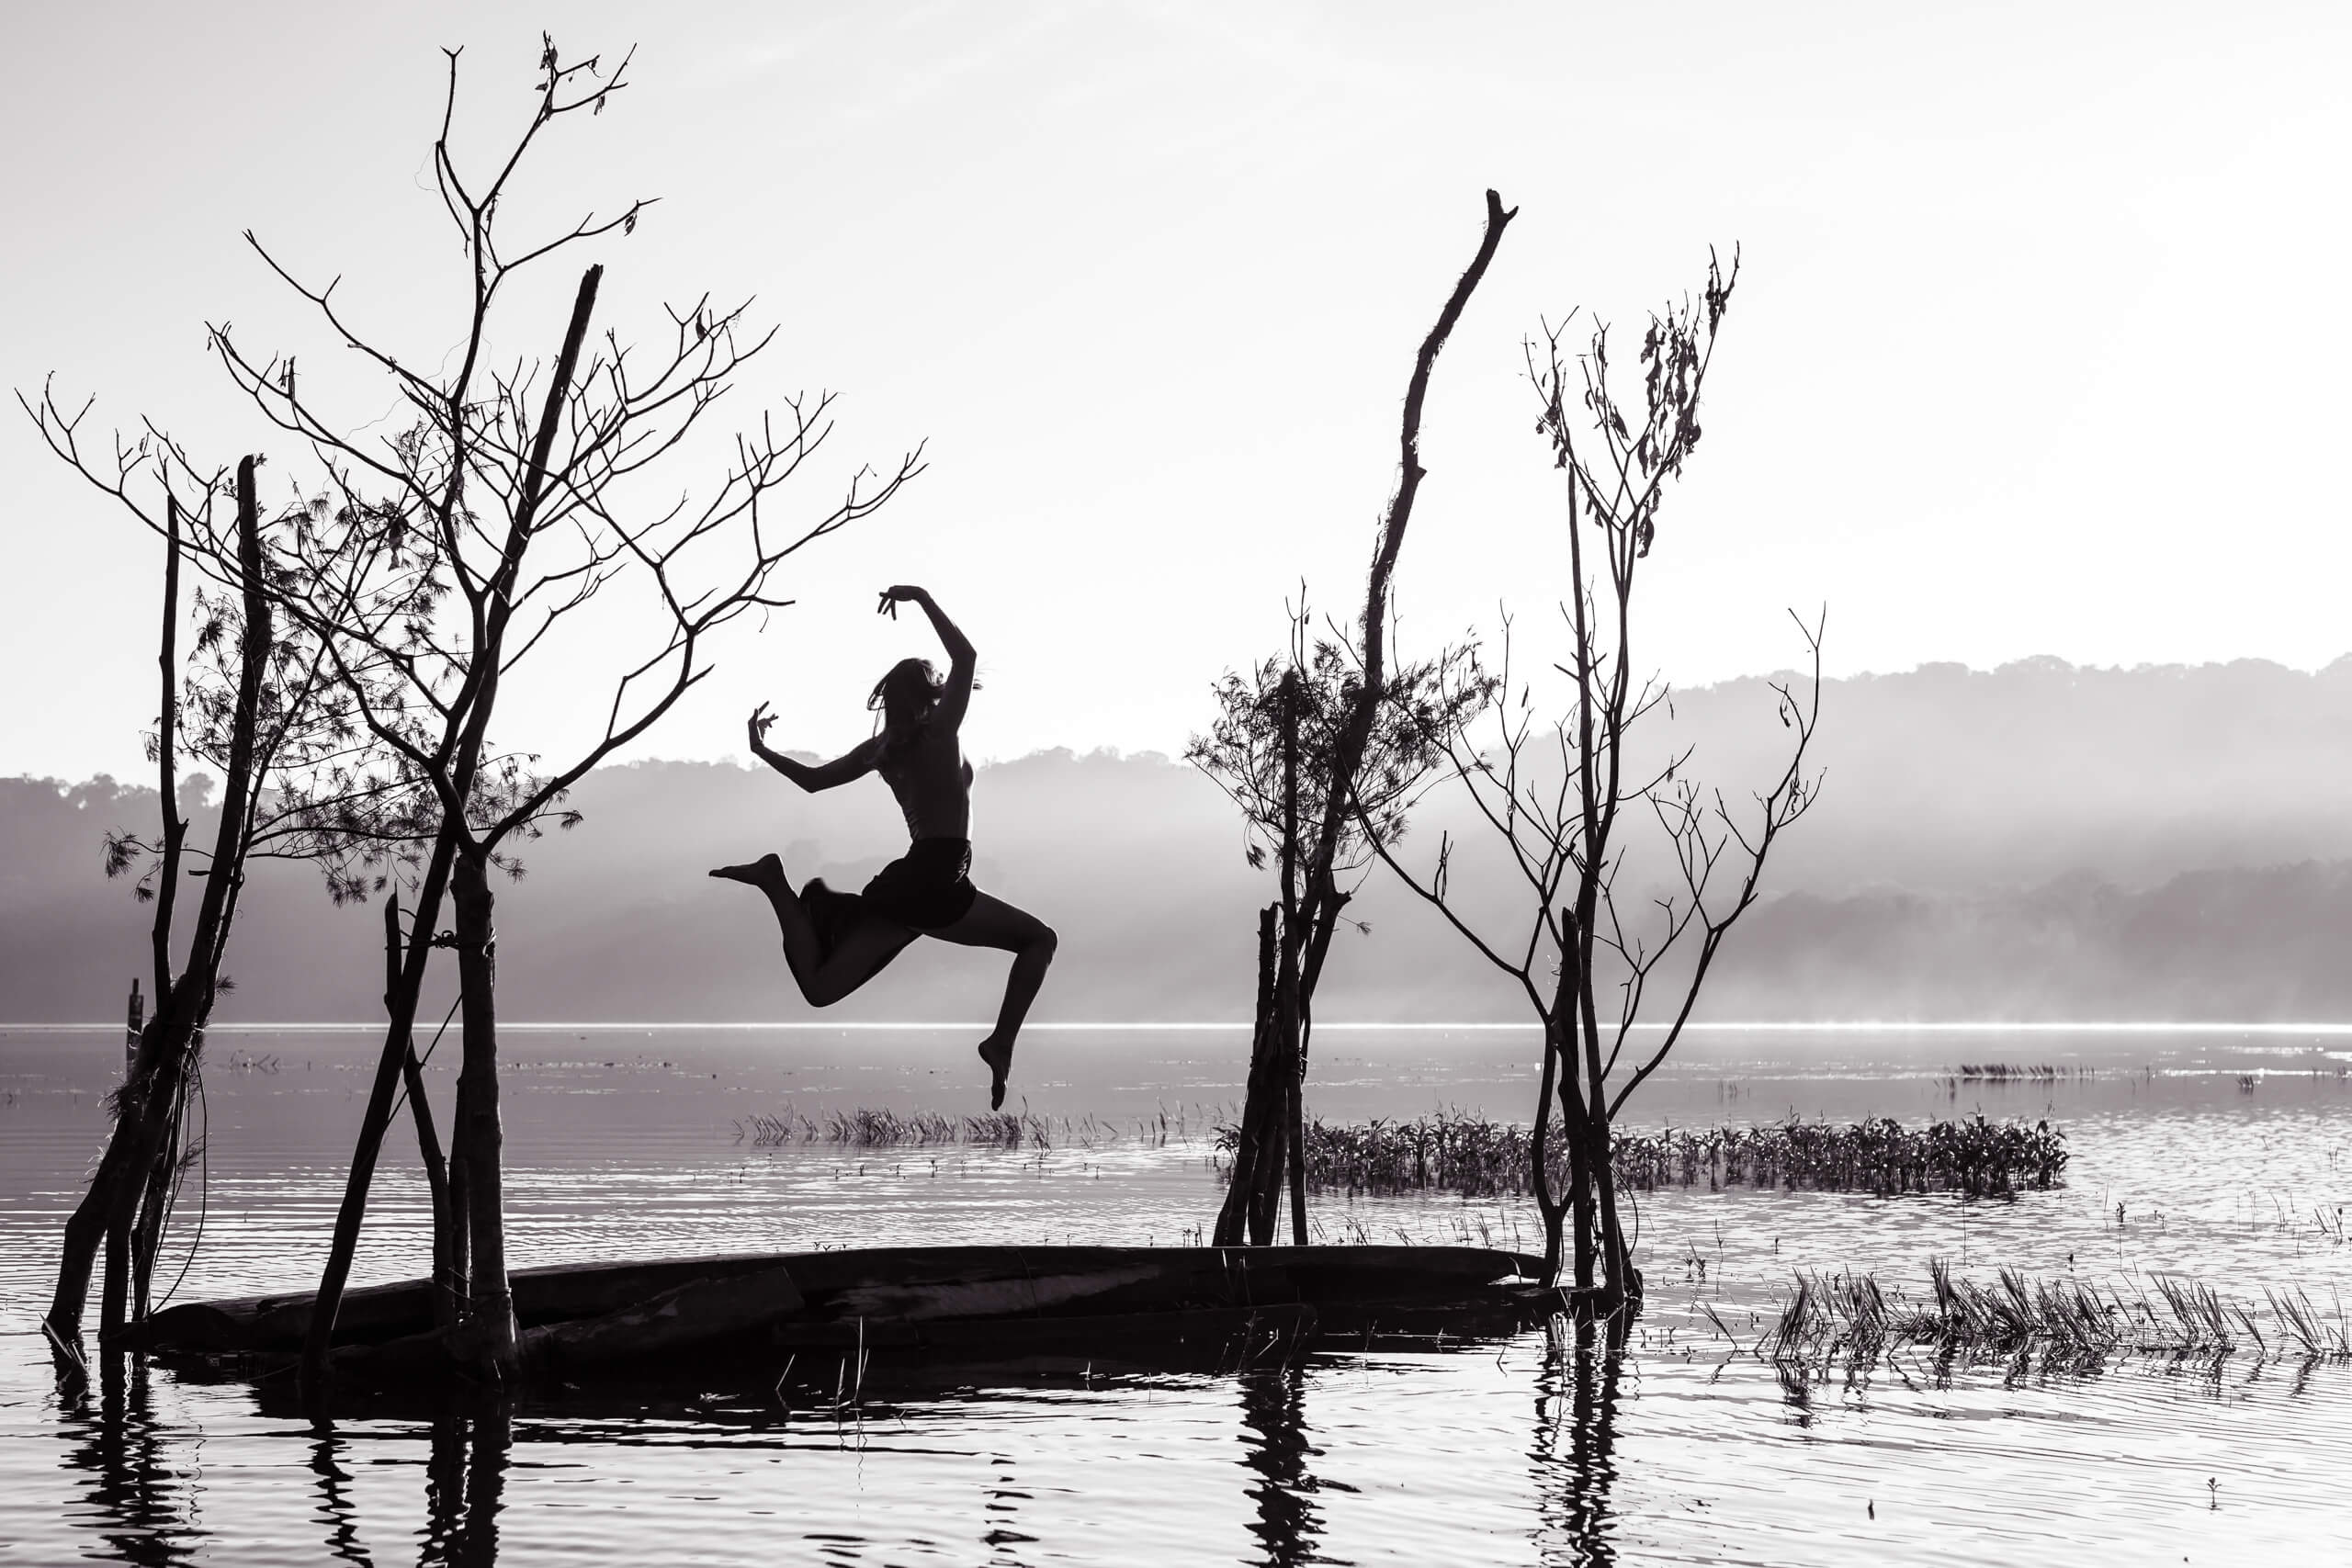 TAMBLINGAN LAKE TEMPLE | The small floating platform made of trees and planks had Sam jumping for joy.